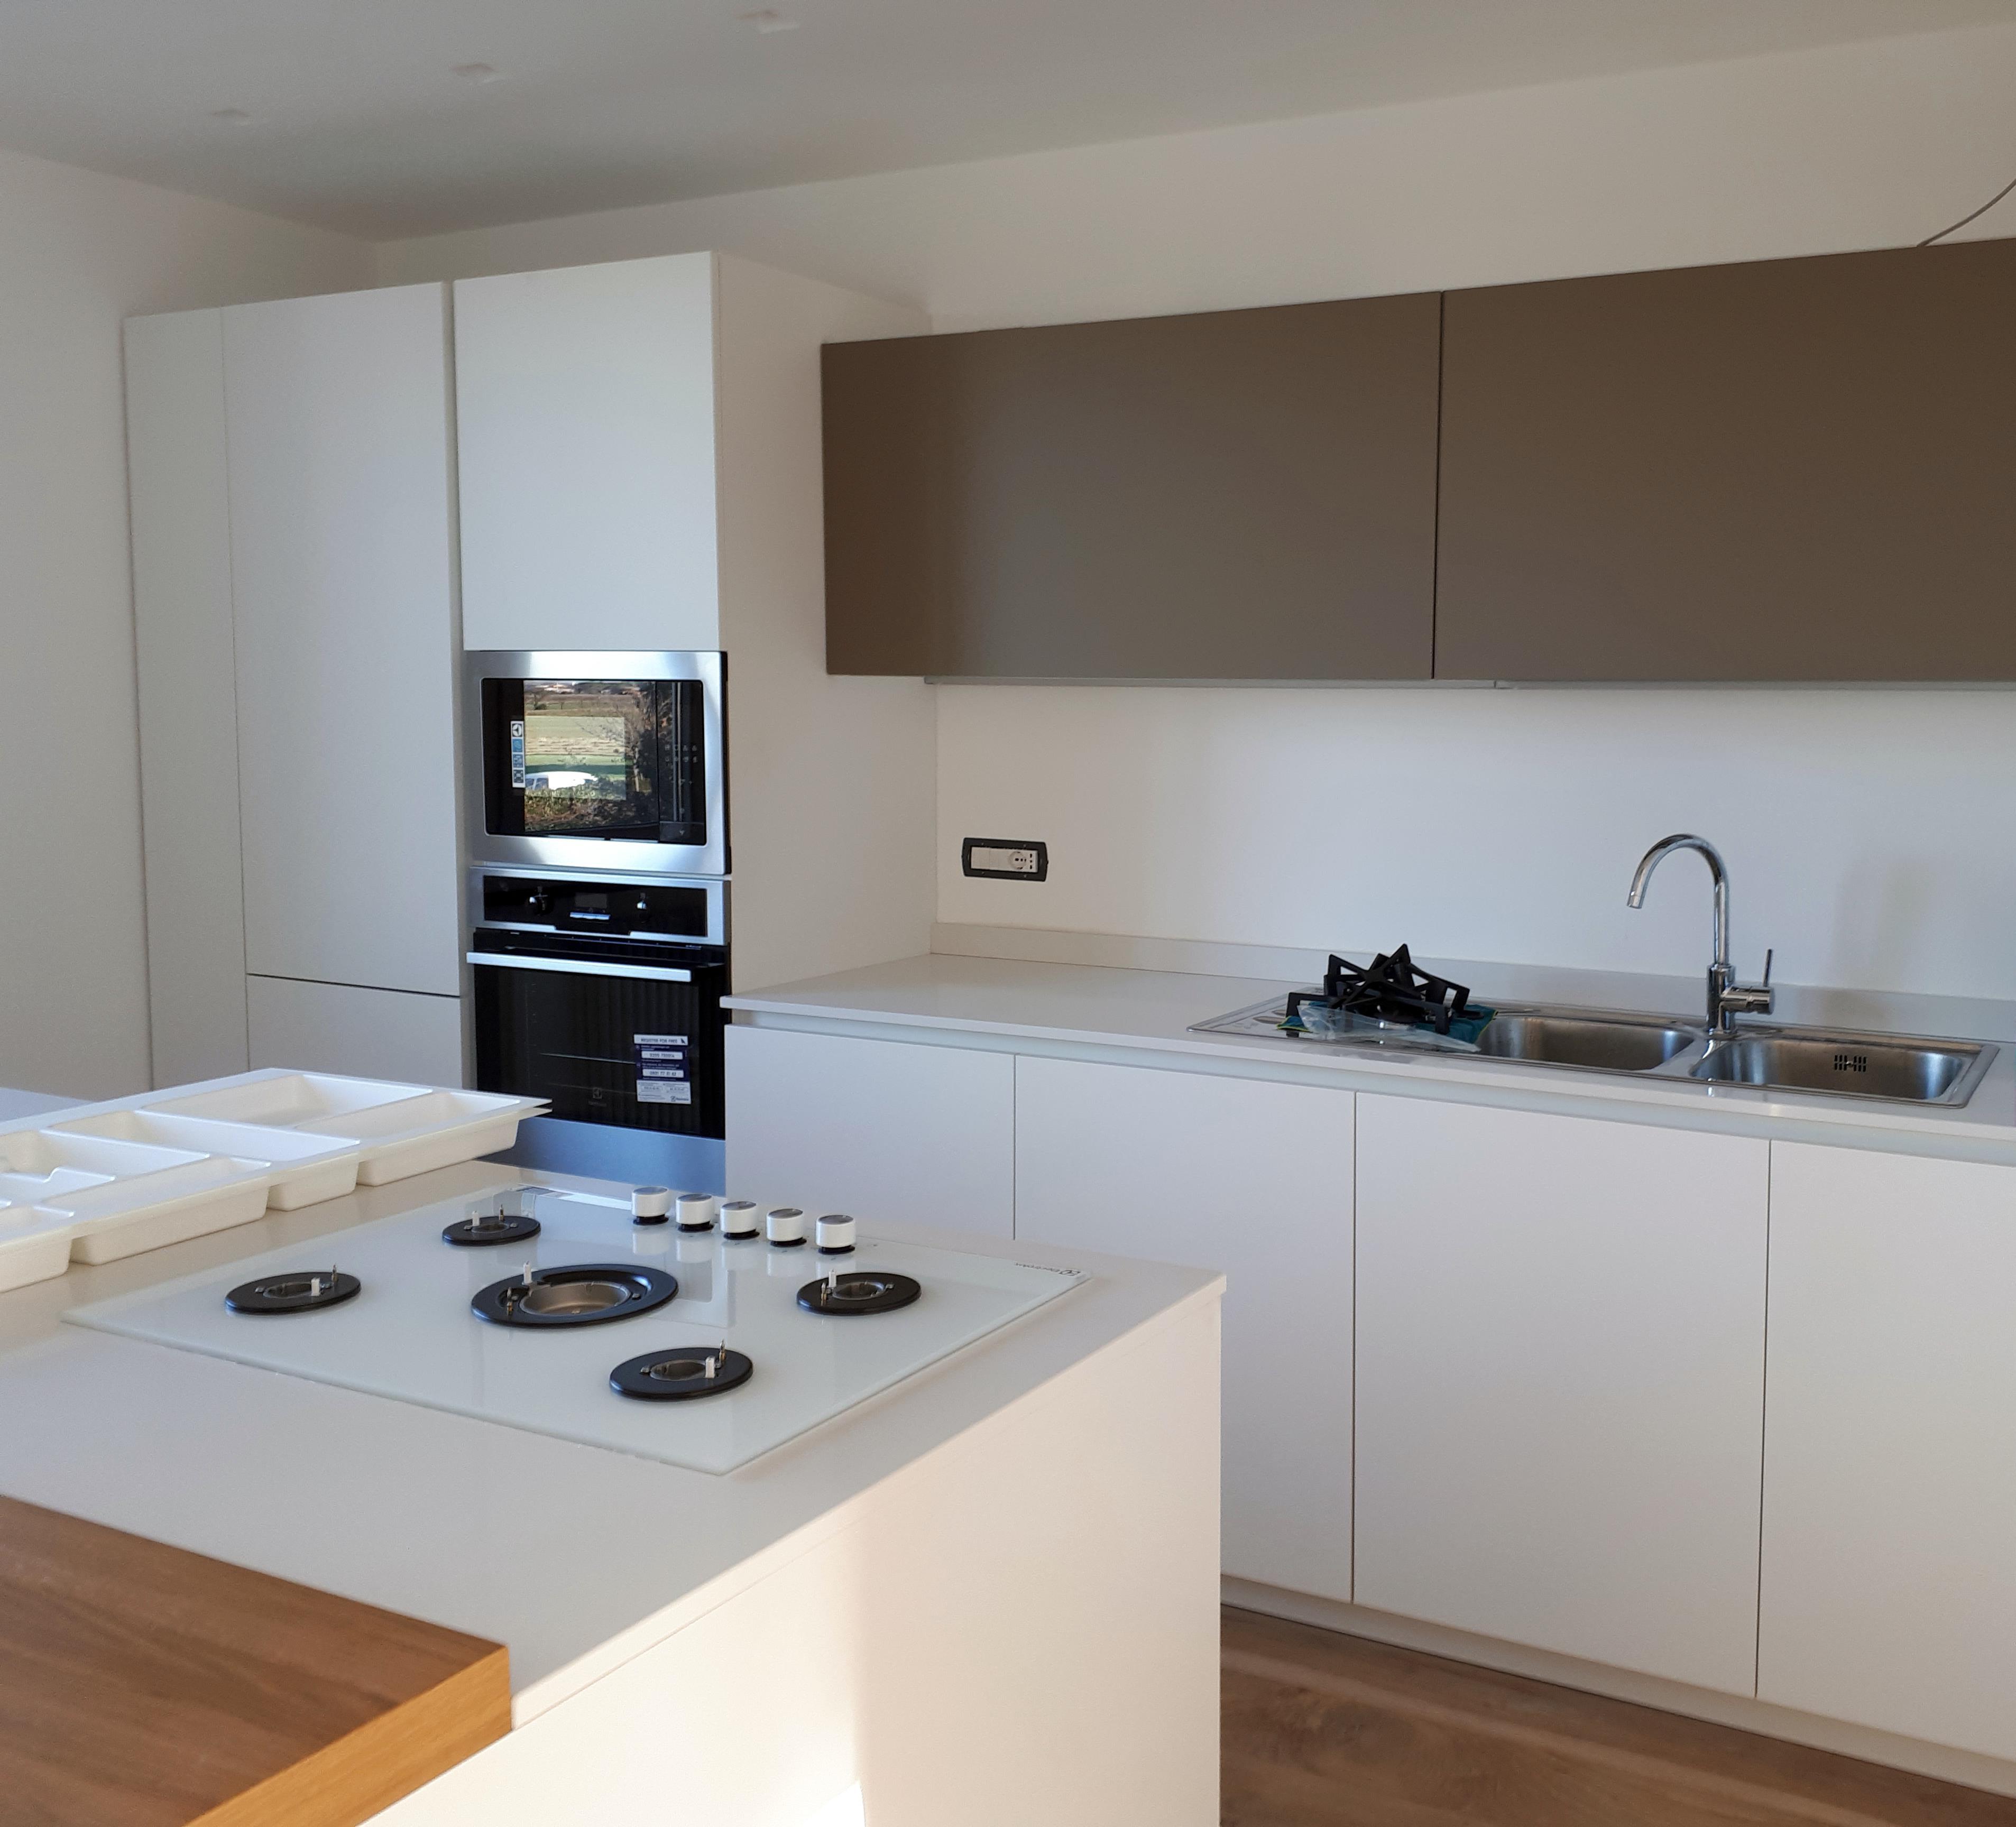 Cucina Veneta Lounge realizzata Farolfi Casa | Farolfi Casa